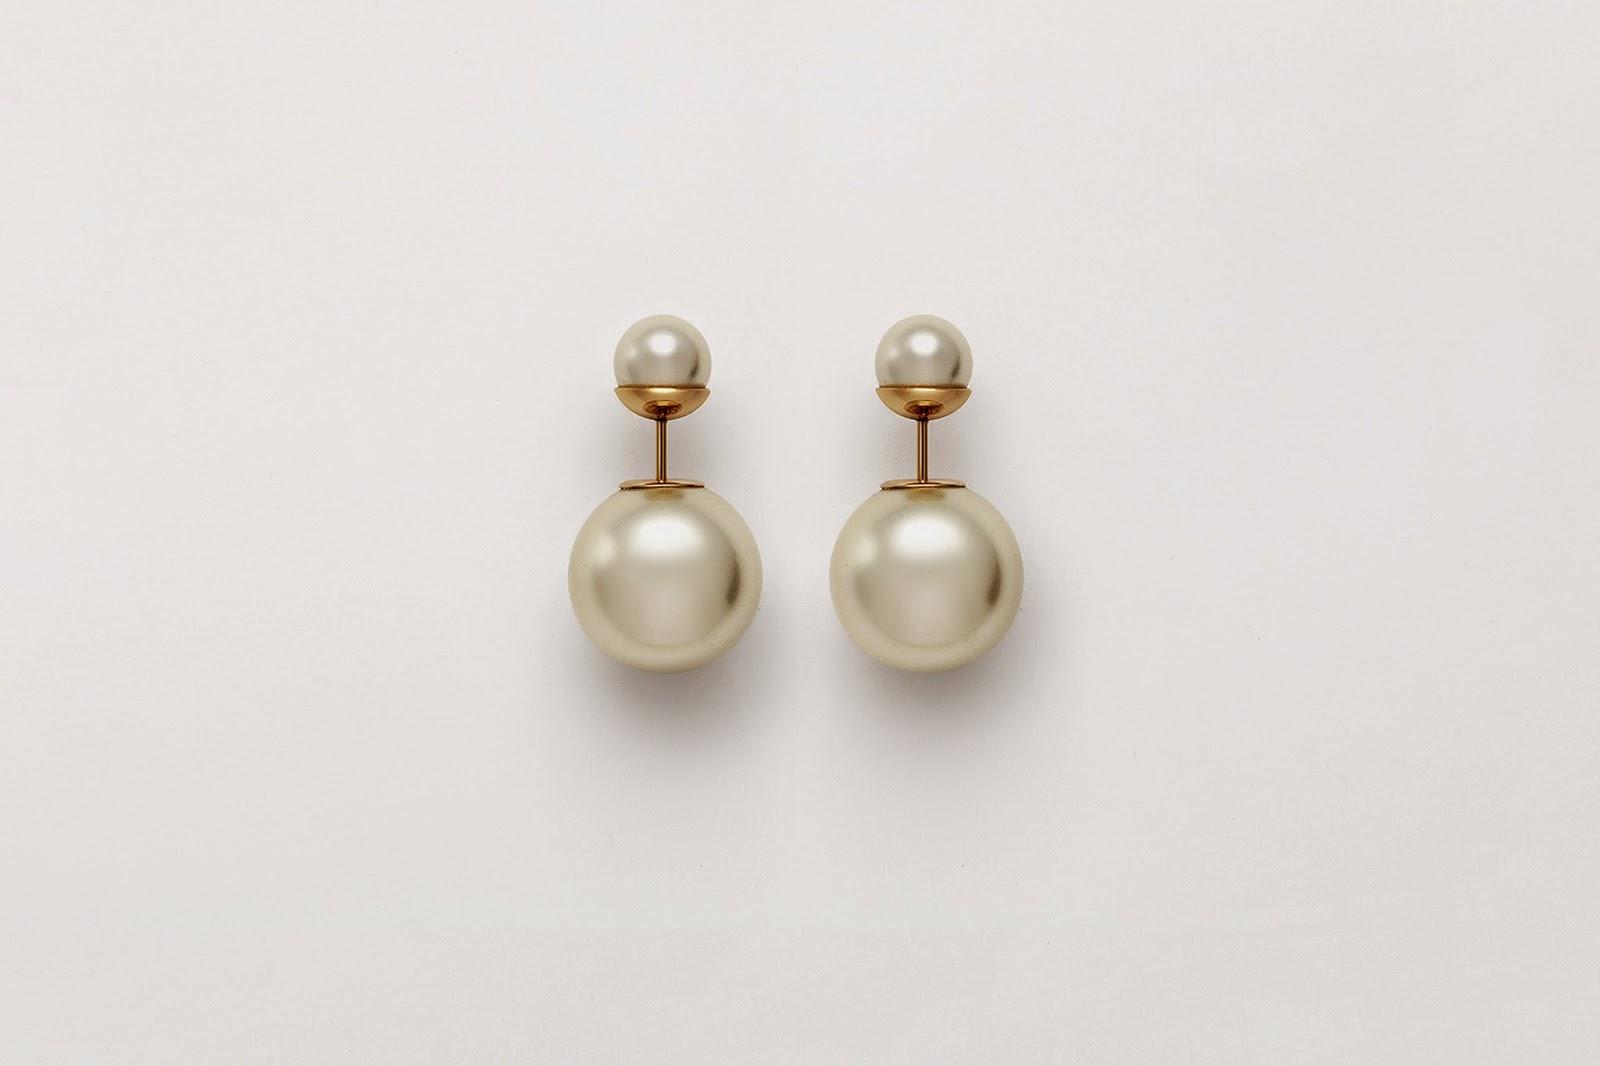 http://www.dior.com/couture/en_us/womens-fashion/accessories/earrings/mise-en-dior-earrings-11-4959#/zoom/1